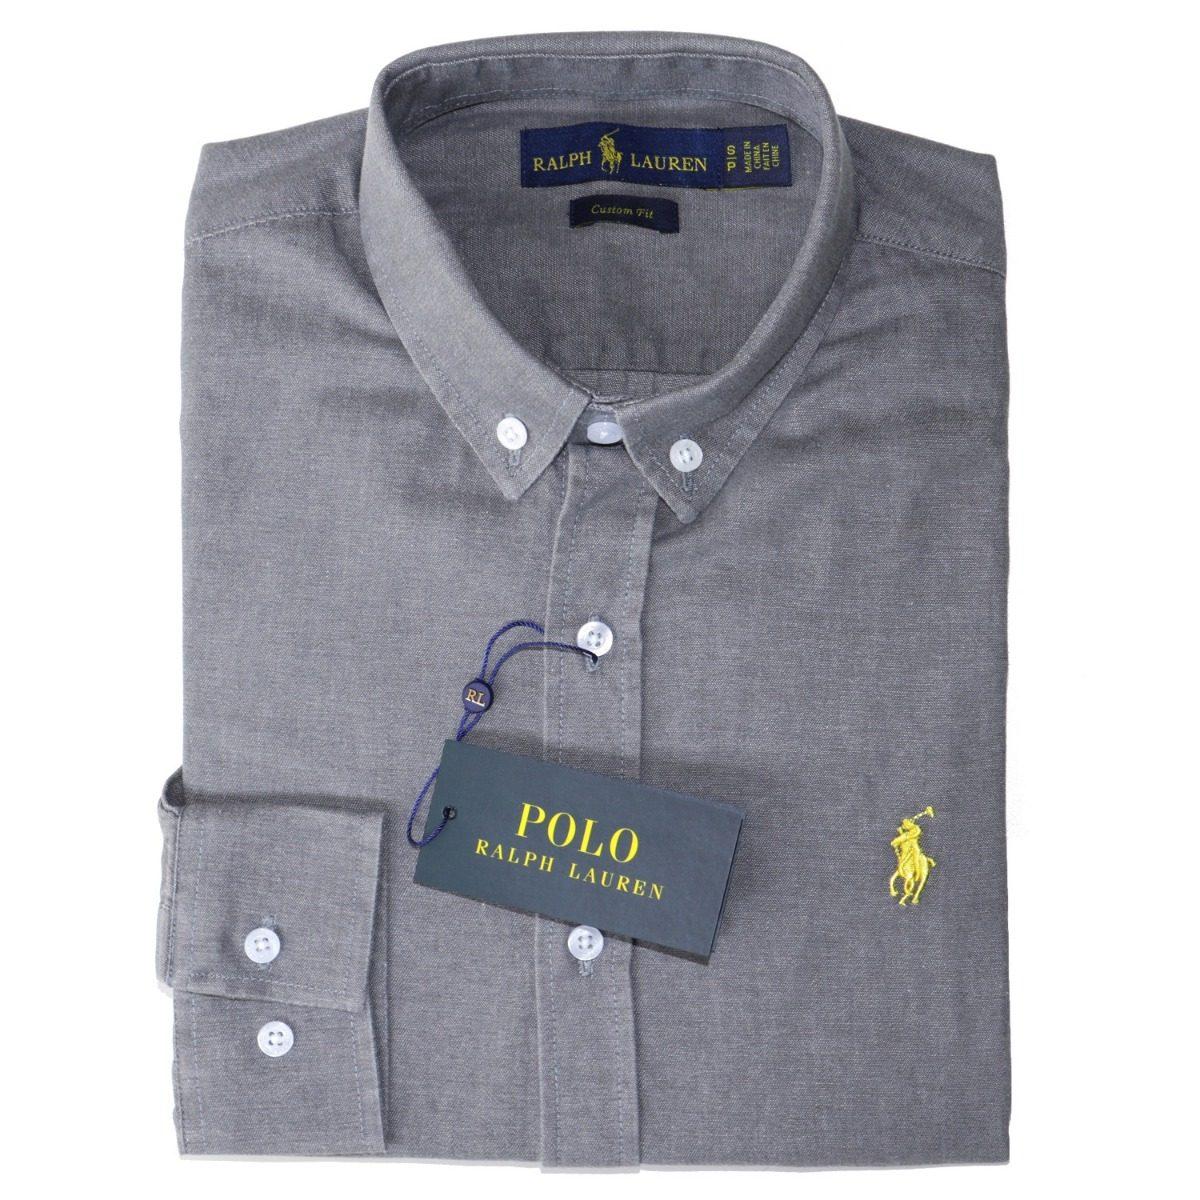 camisa social ralph lauren cst fit cinza masculino original. Carregando zoom . d46dcbb8ee8